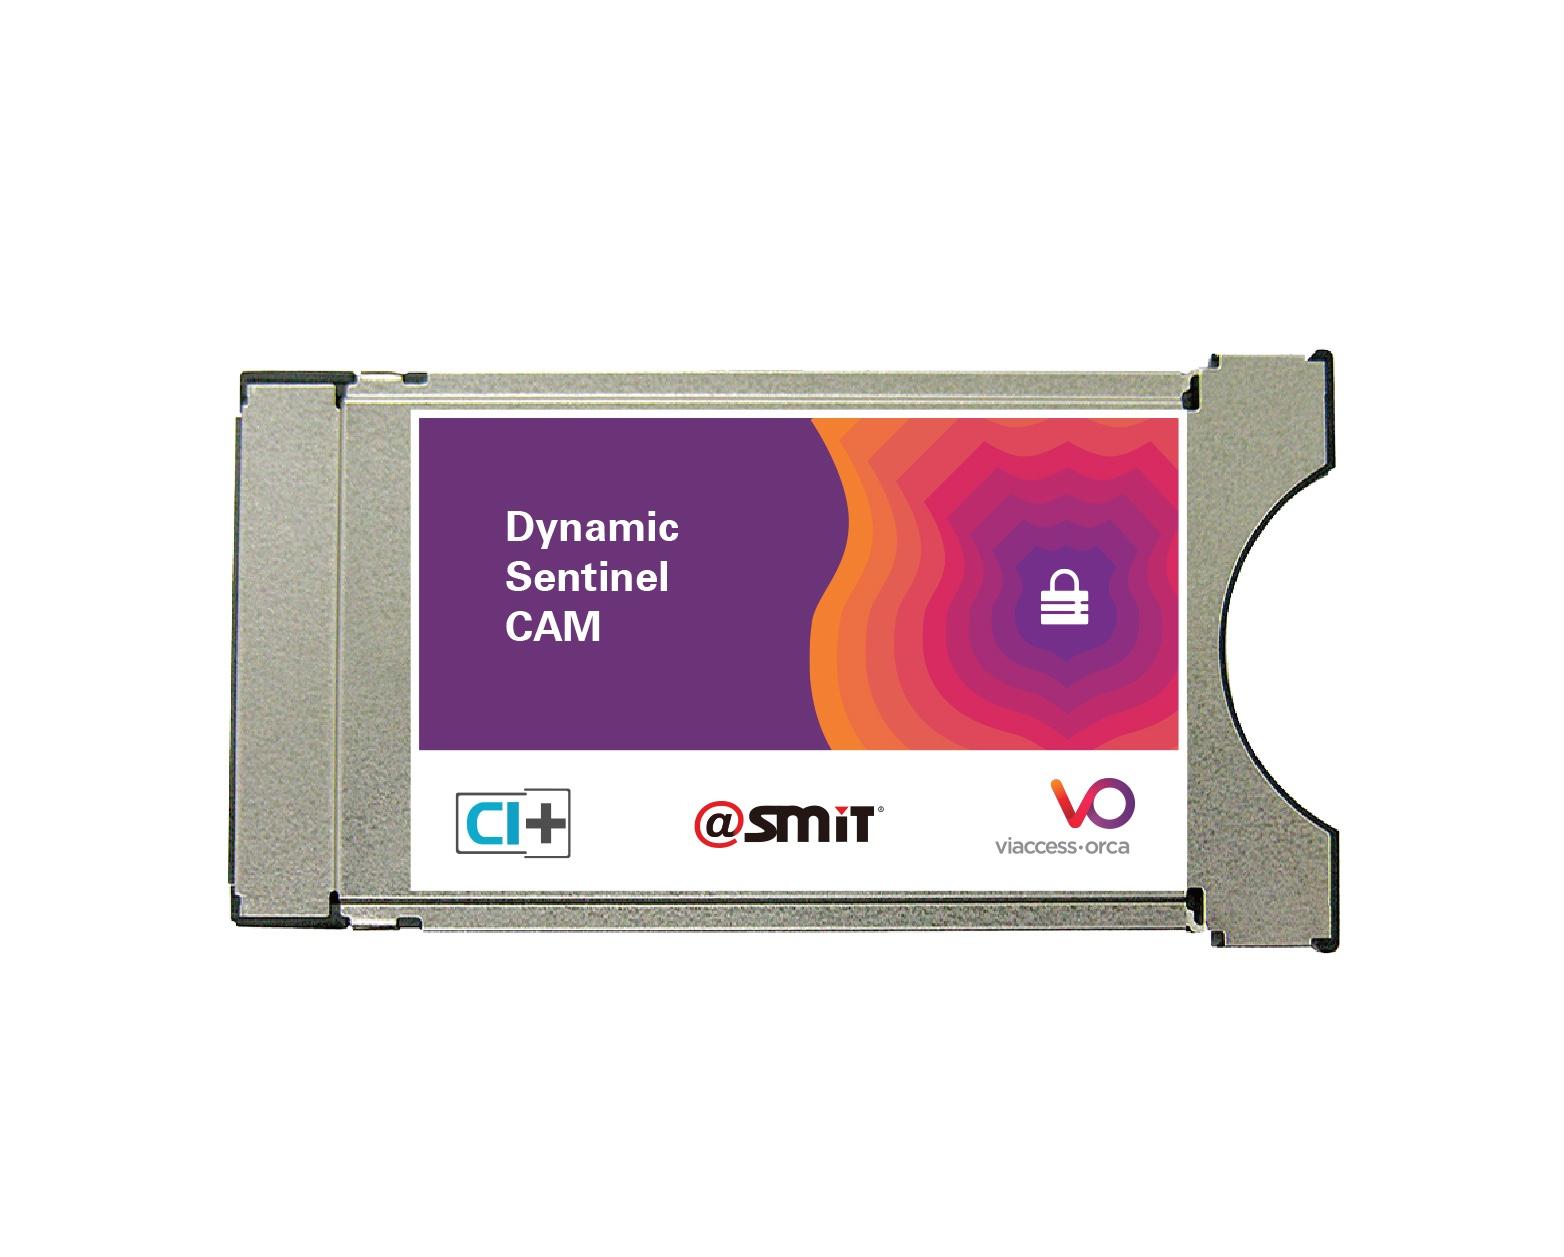 SMiT-Dynamic-Sentinel-CAM.jpg